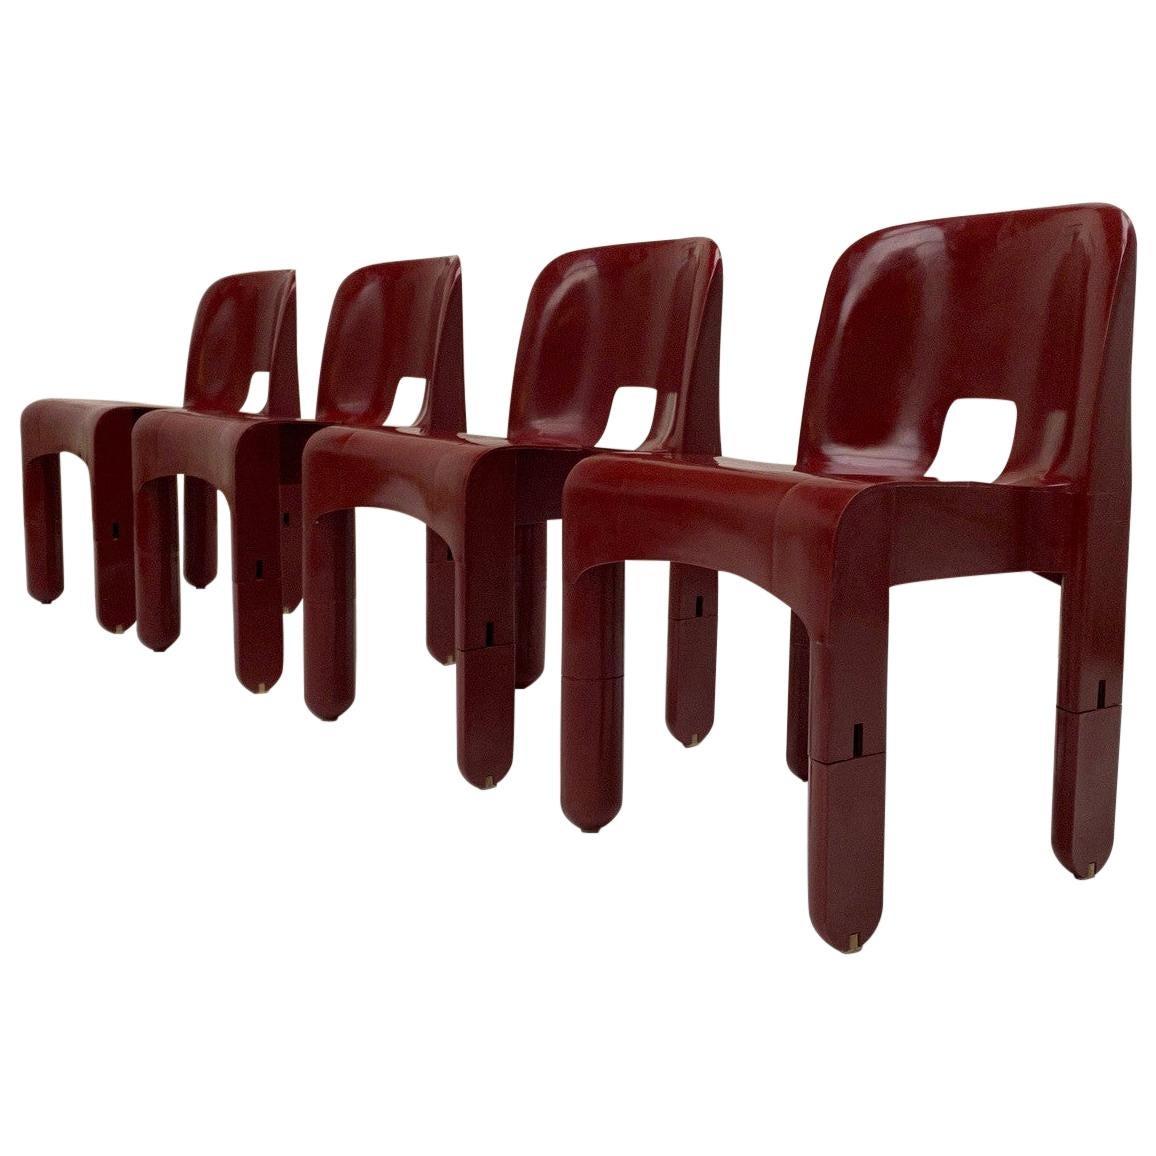 Universale Chair